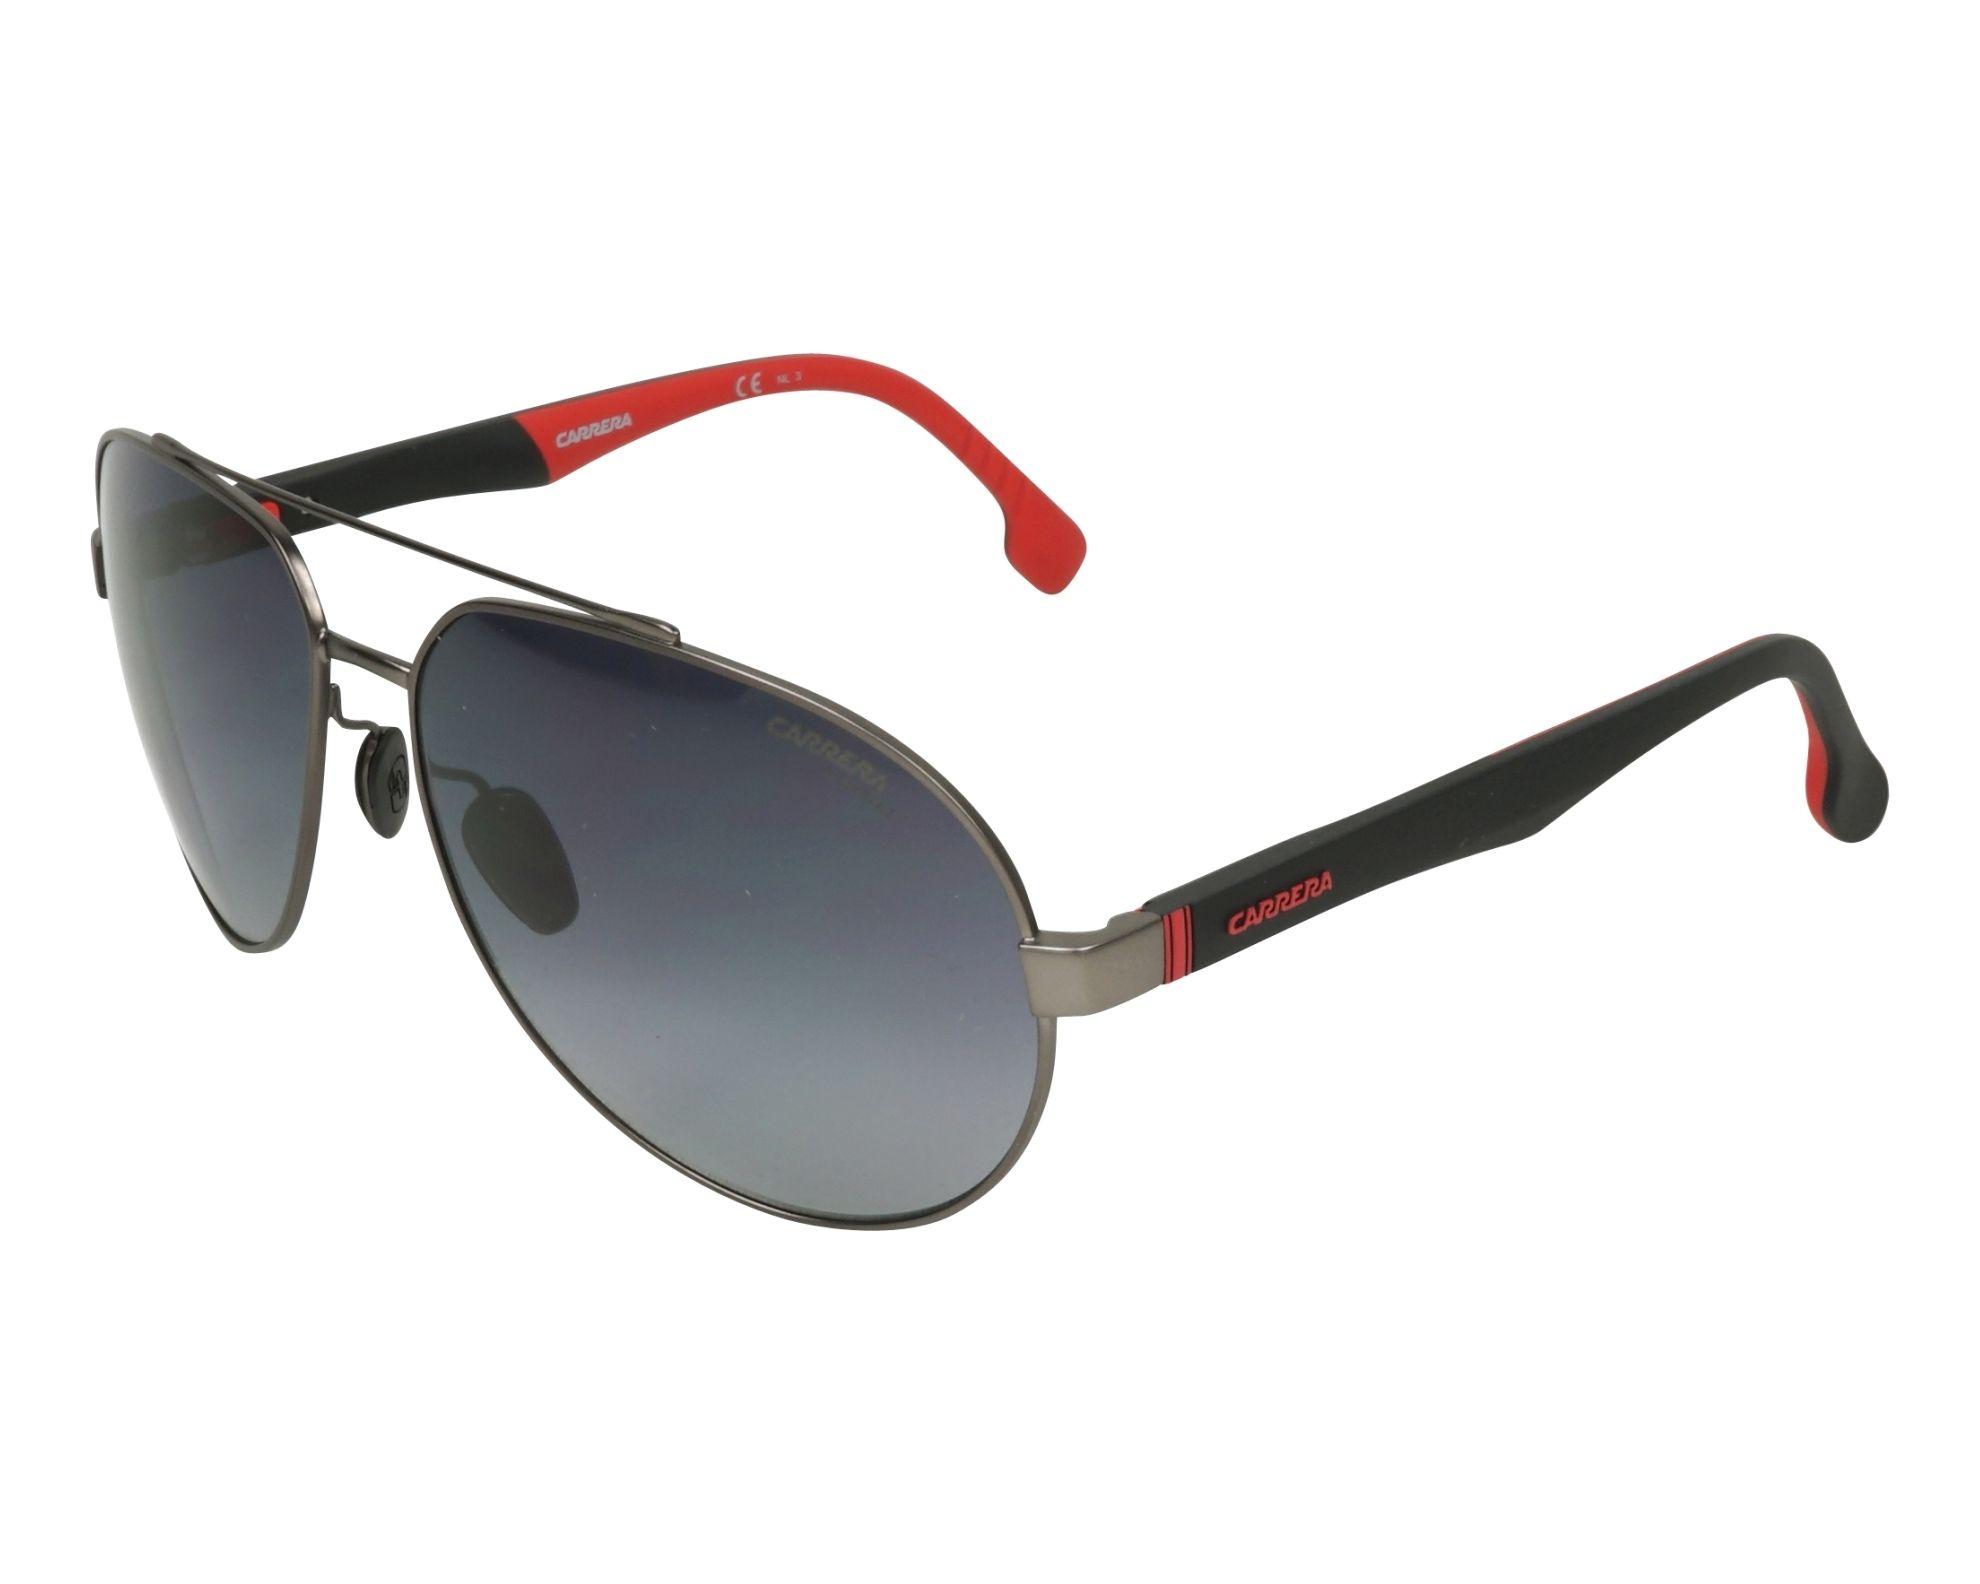 CARRERA Sonnenbrille 8025/S skZcS8